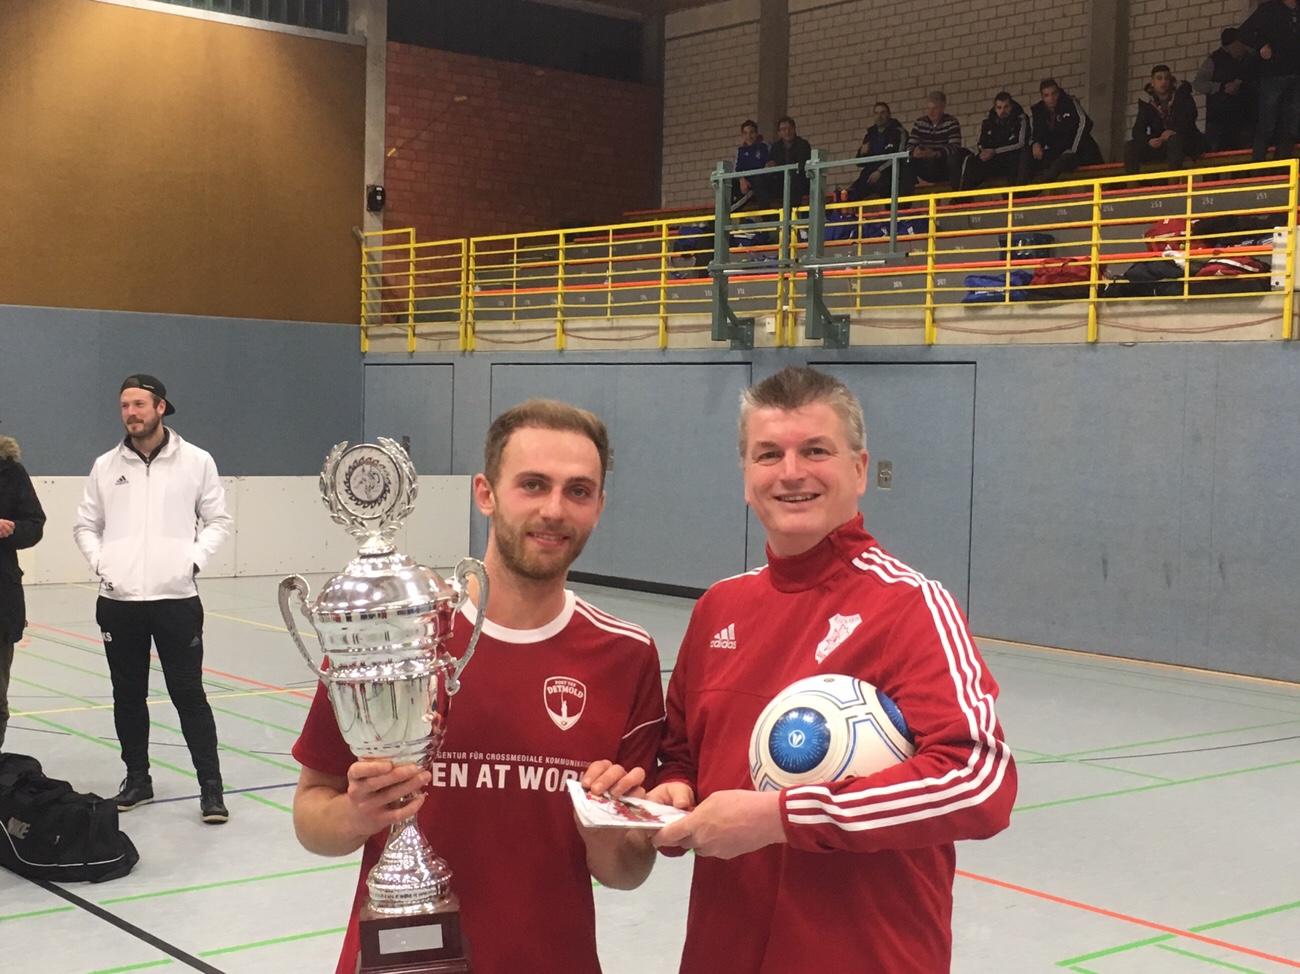 Post TSV Detmold gewinnt den Classic Cup im Endspiel gegen SC Bad Salzuflen